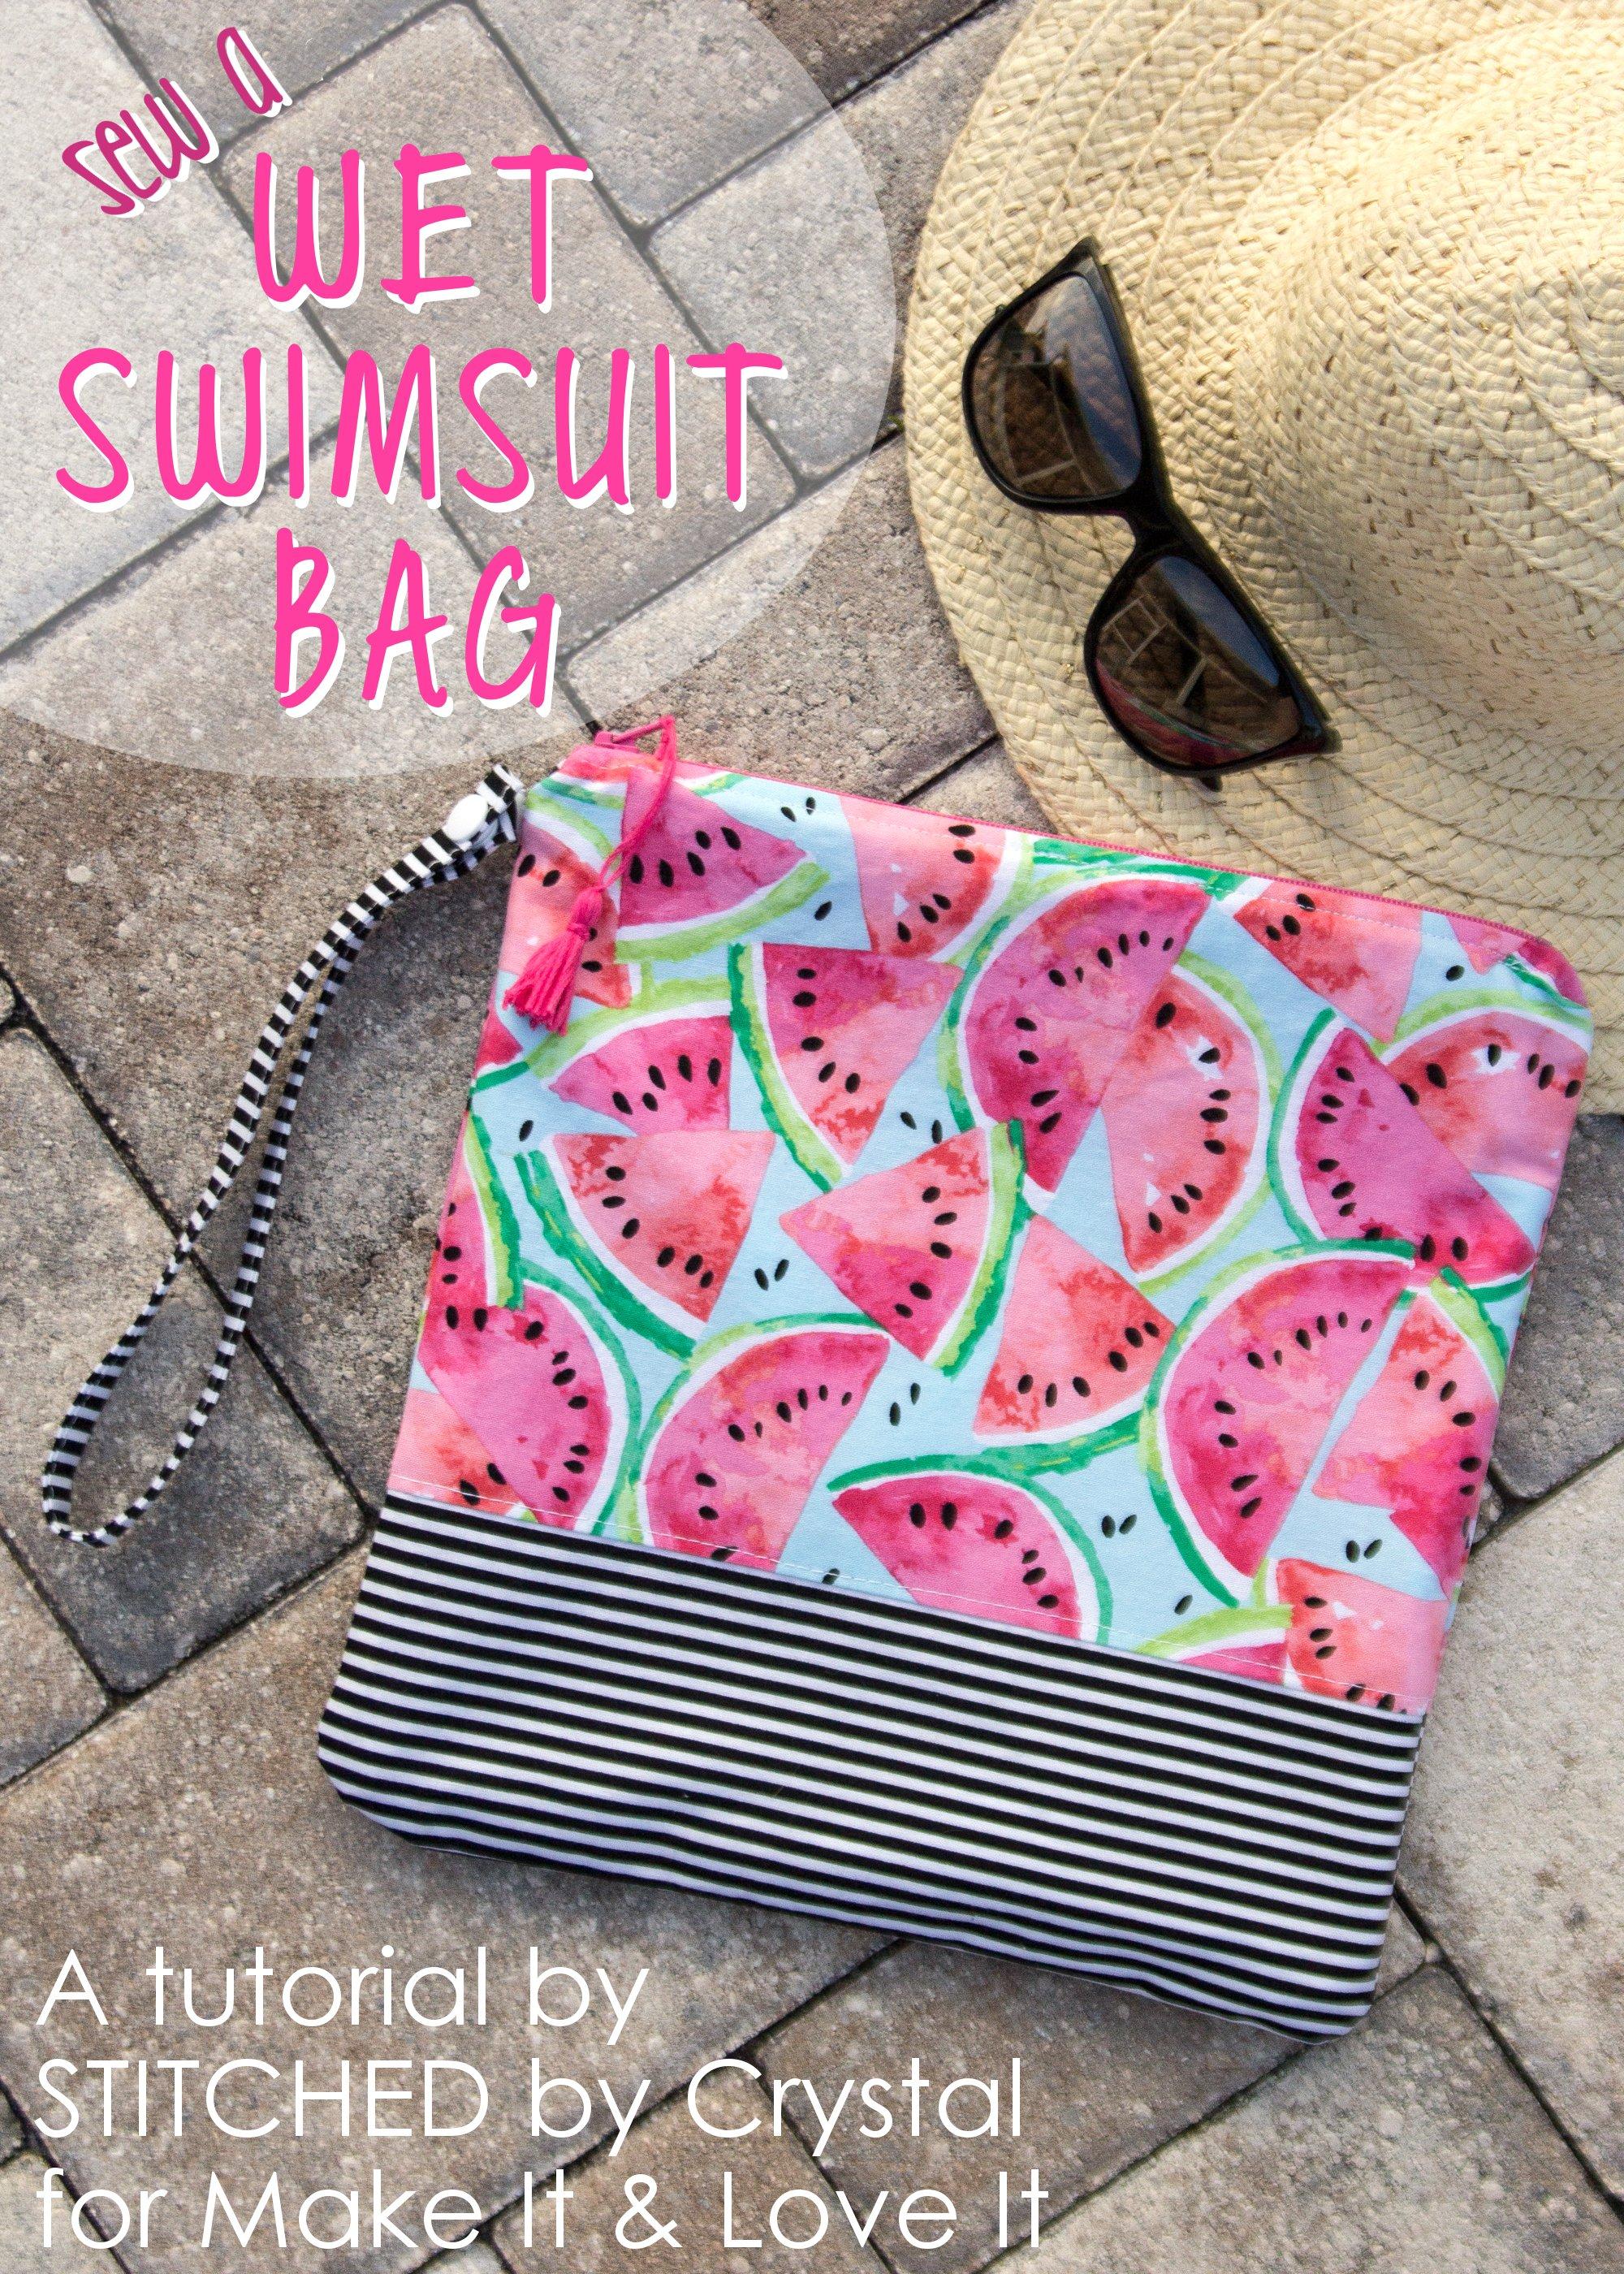 Sew a Wet Swimsuit Bag!